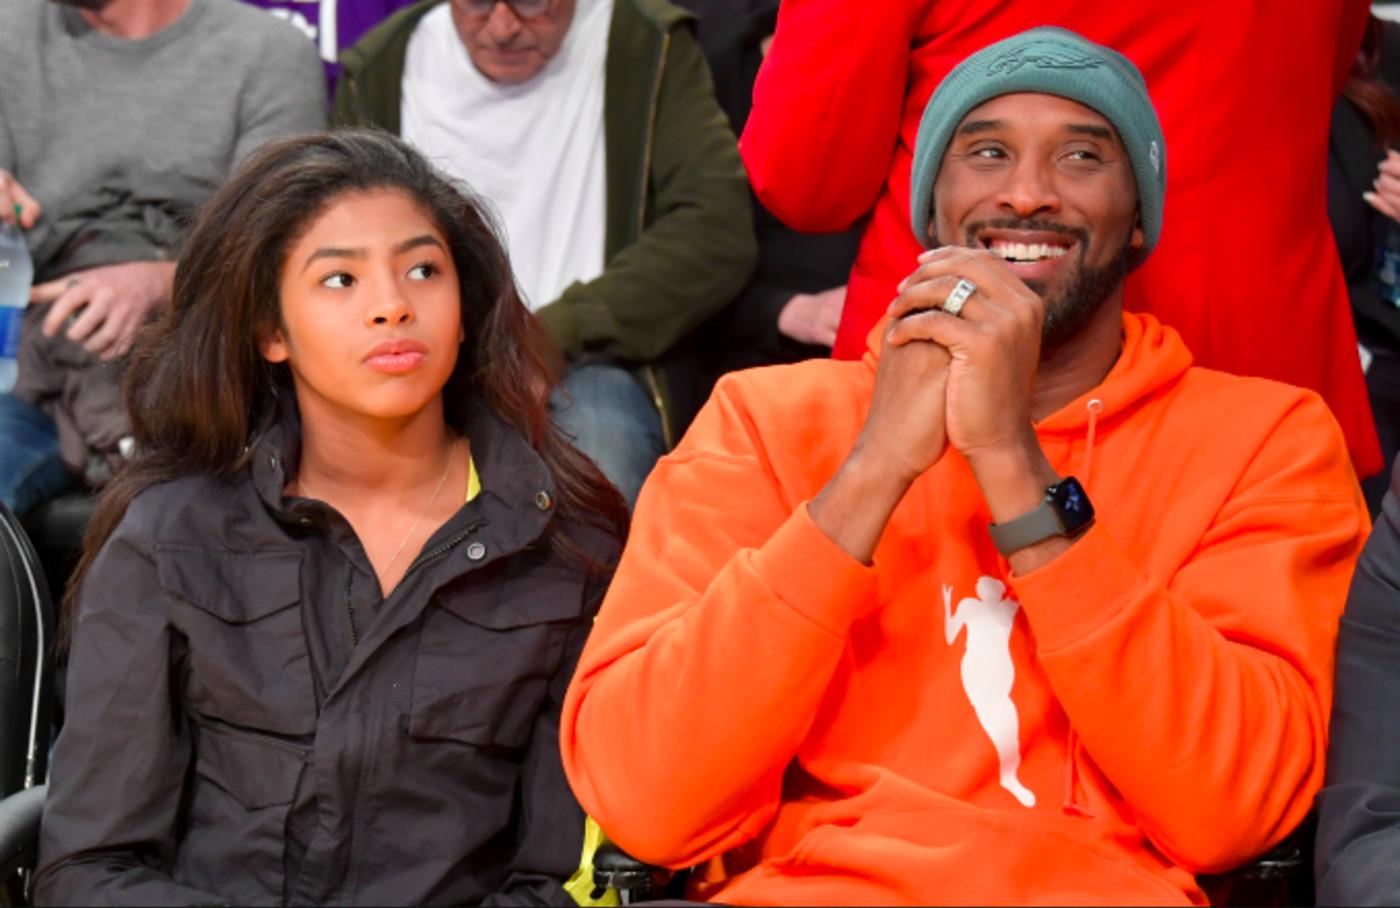 Kobe Bryant the Los Angeles Lakers and the Dallas Mavericks